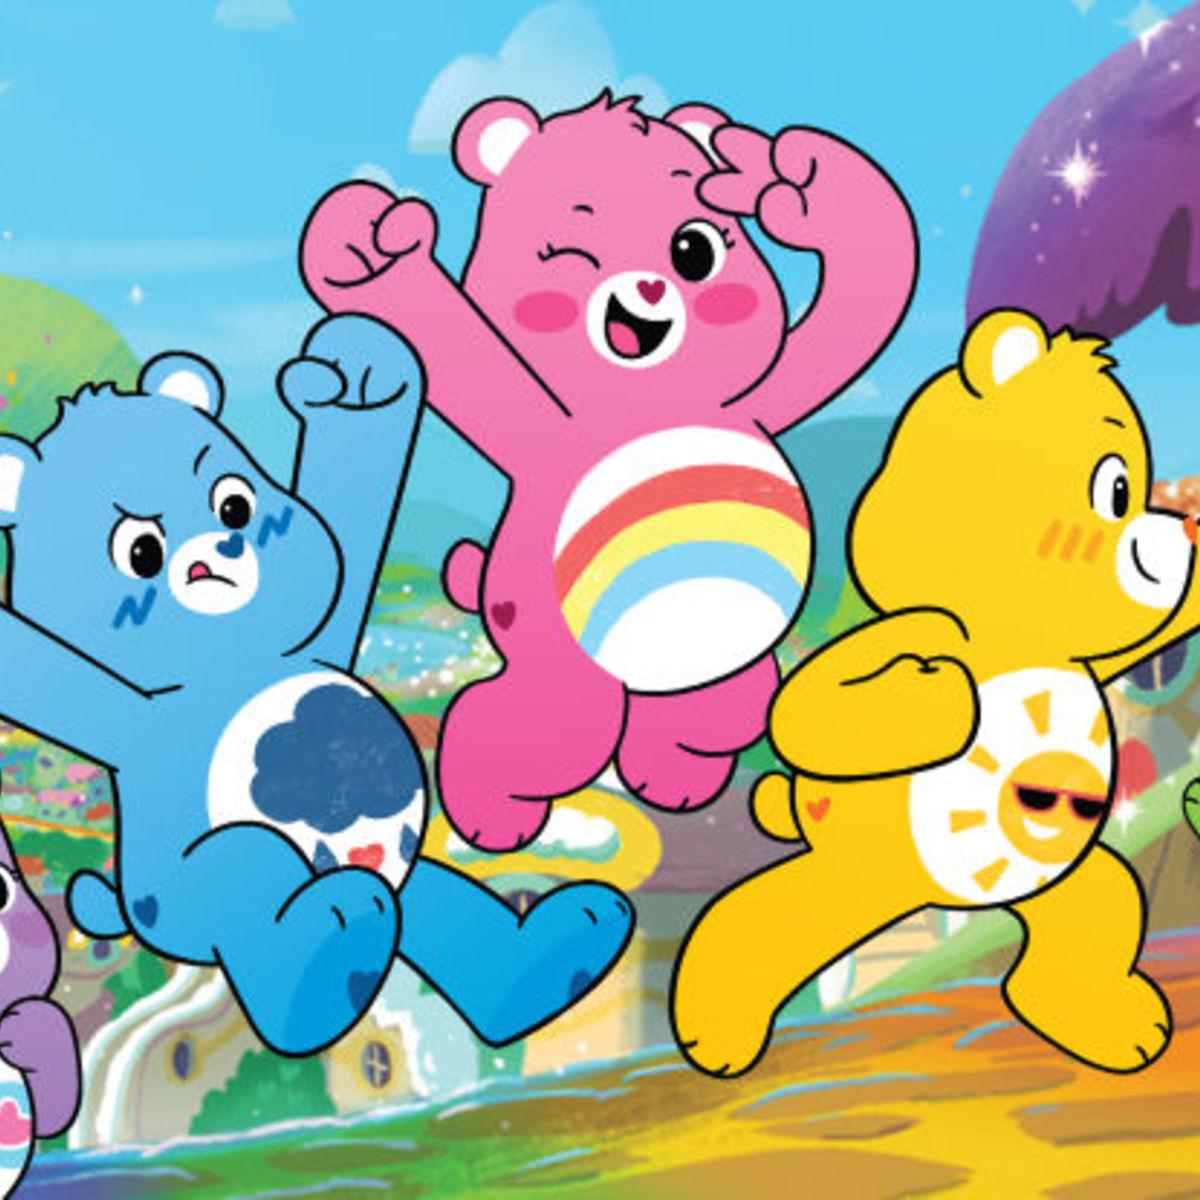 Care Bears: Enter the Magic